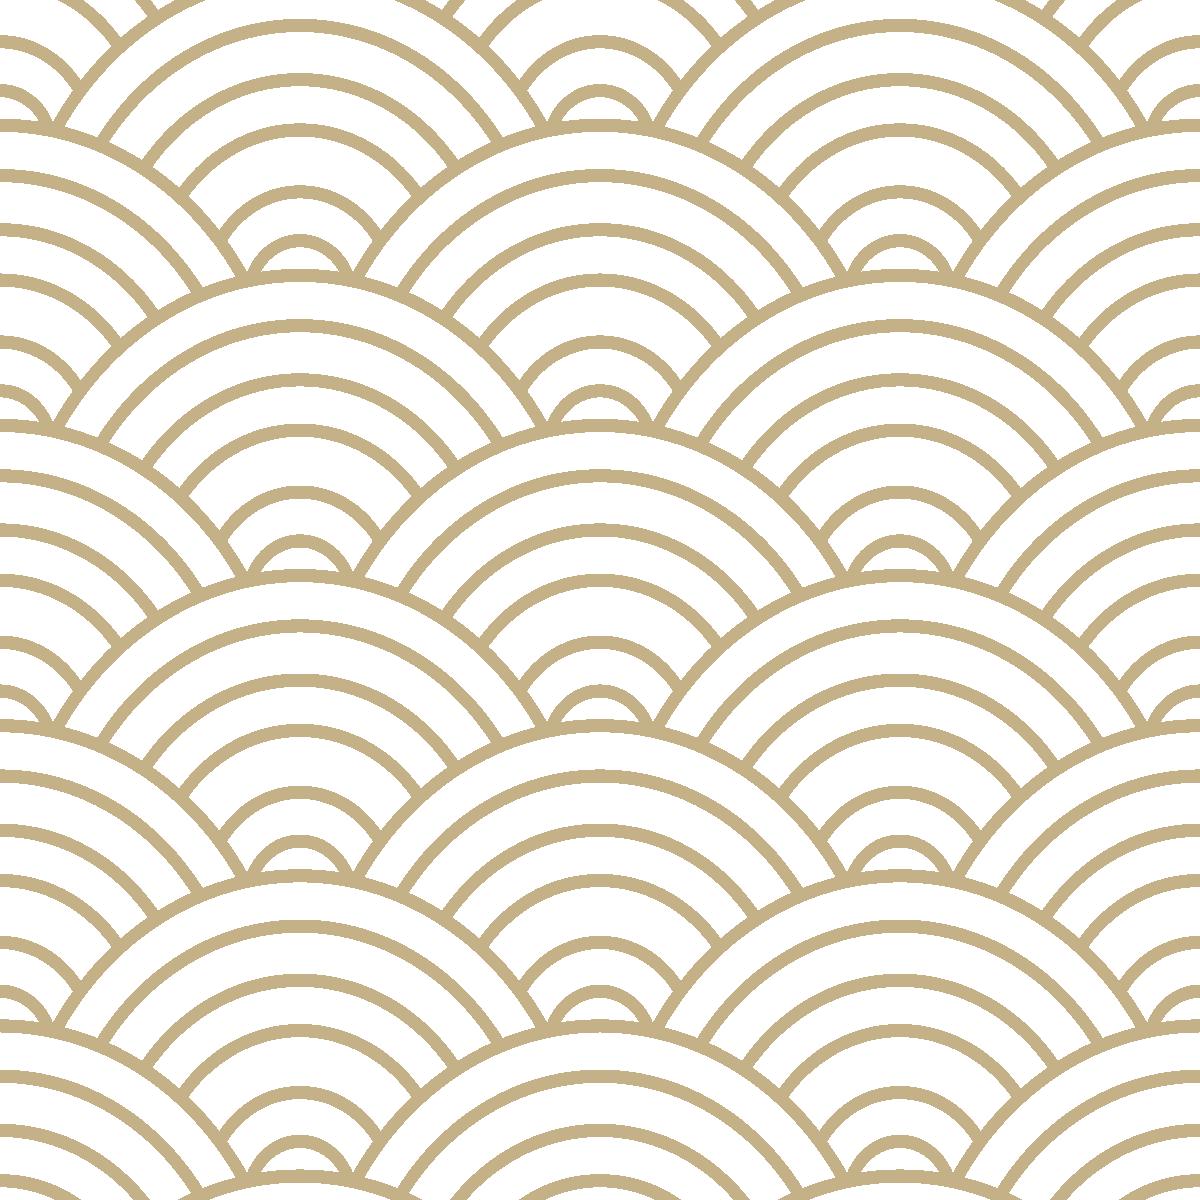 N14_Pattern-Waves_Square@2x